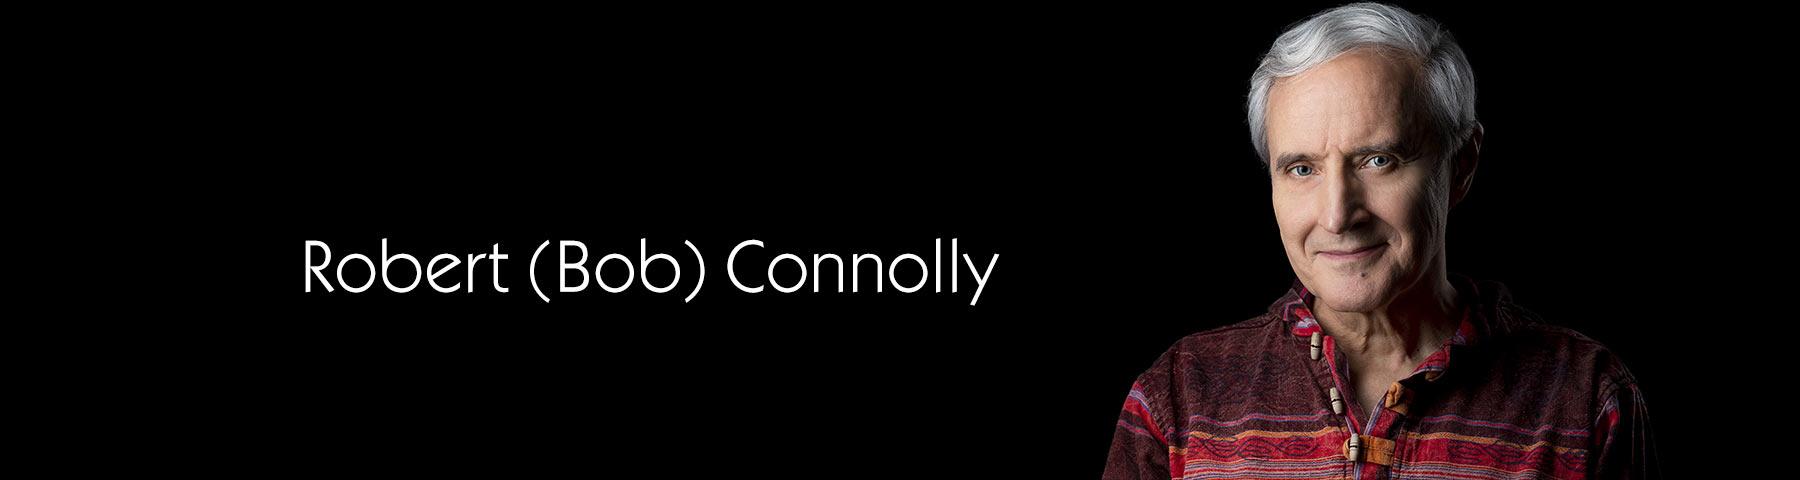 Robert (Bob) William Connolly - Canadian Media Producer